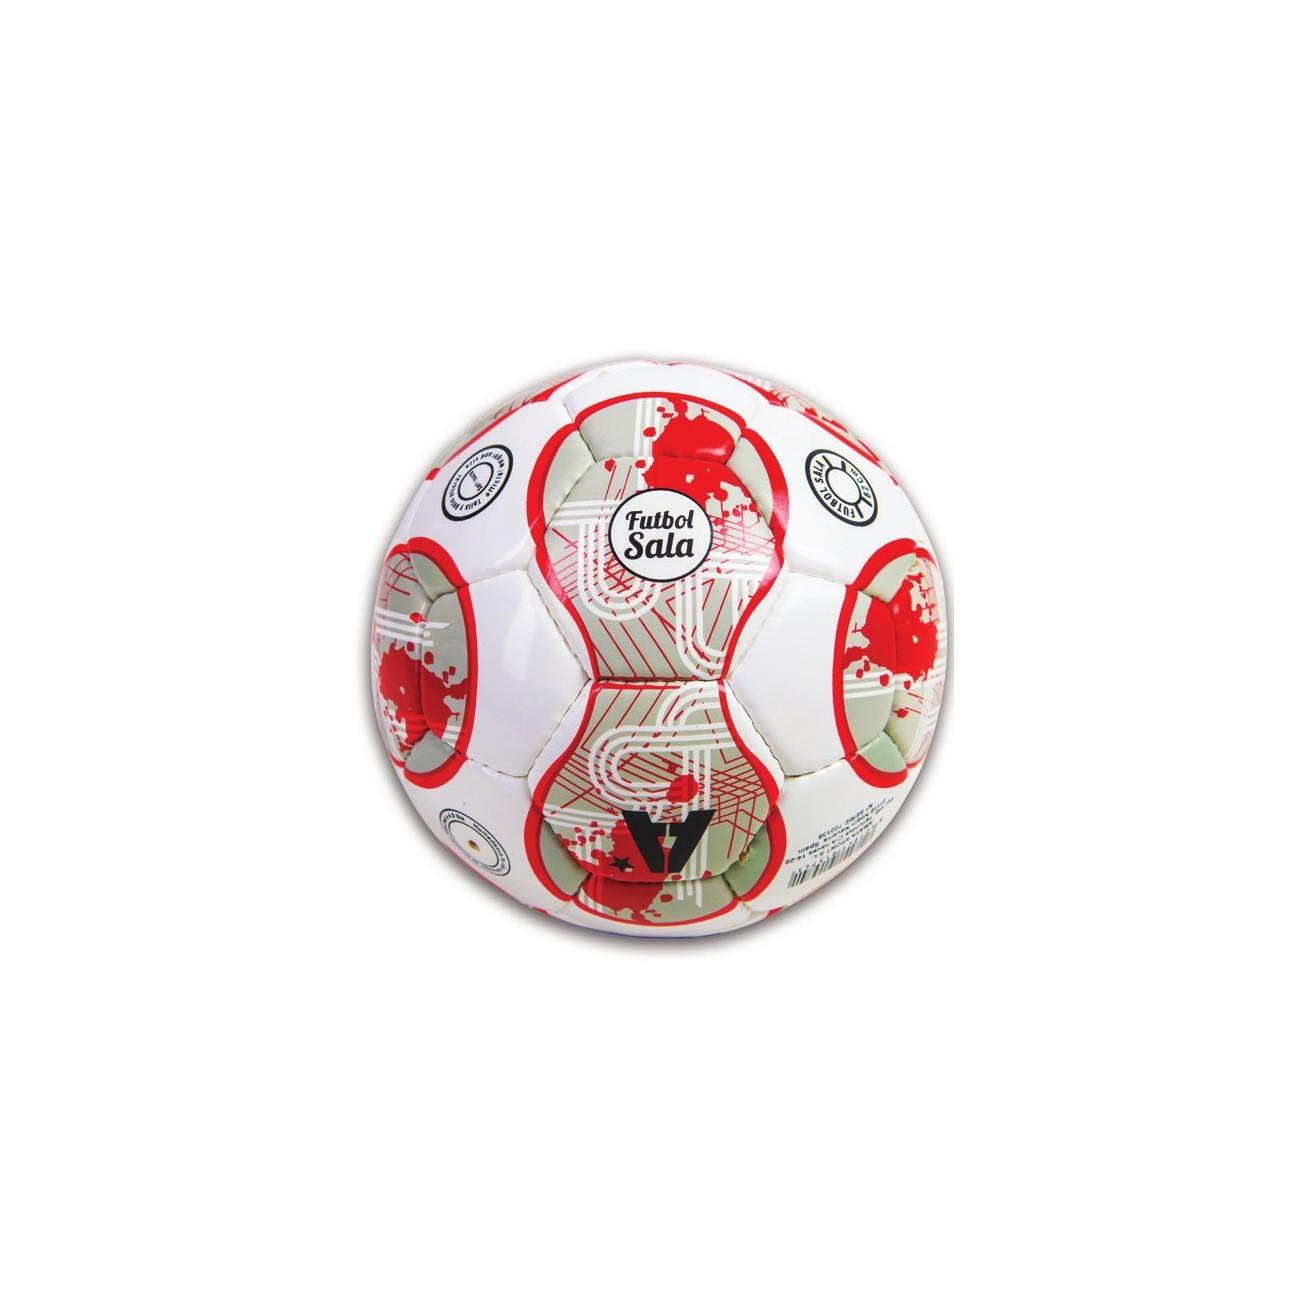 "Balón fútbol sala Cuero ""soft touch"" - AmayaSport 4a5382eba3e96"